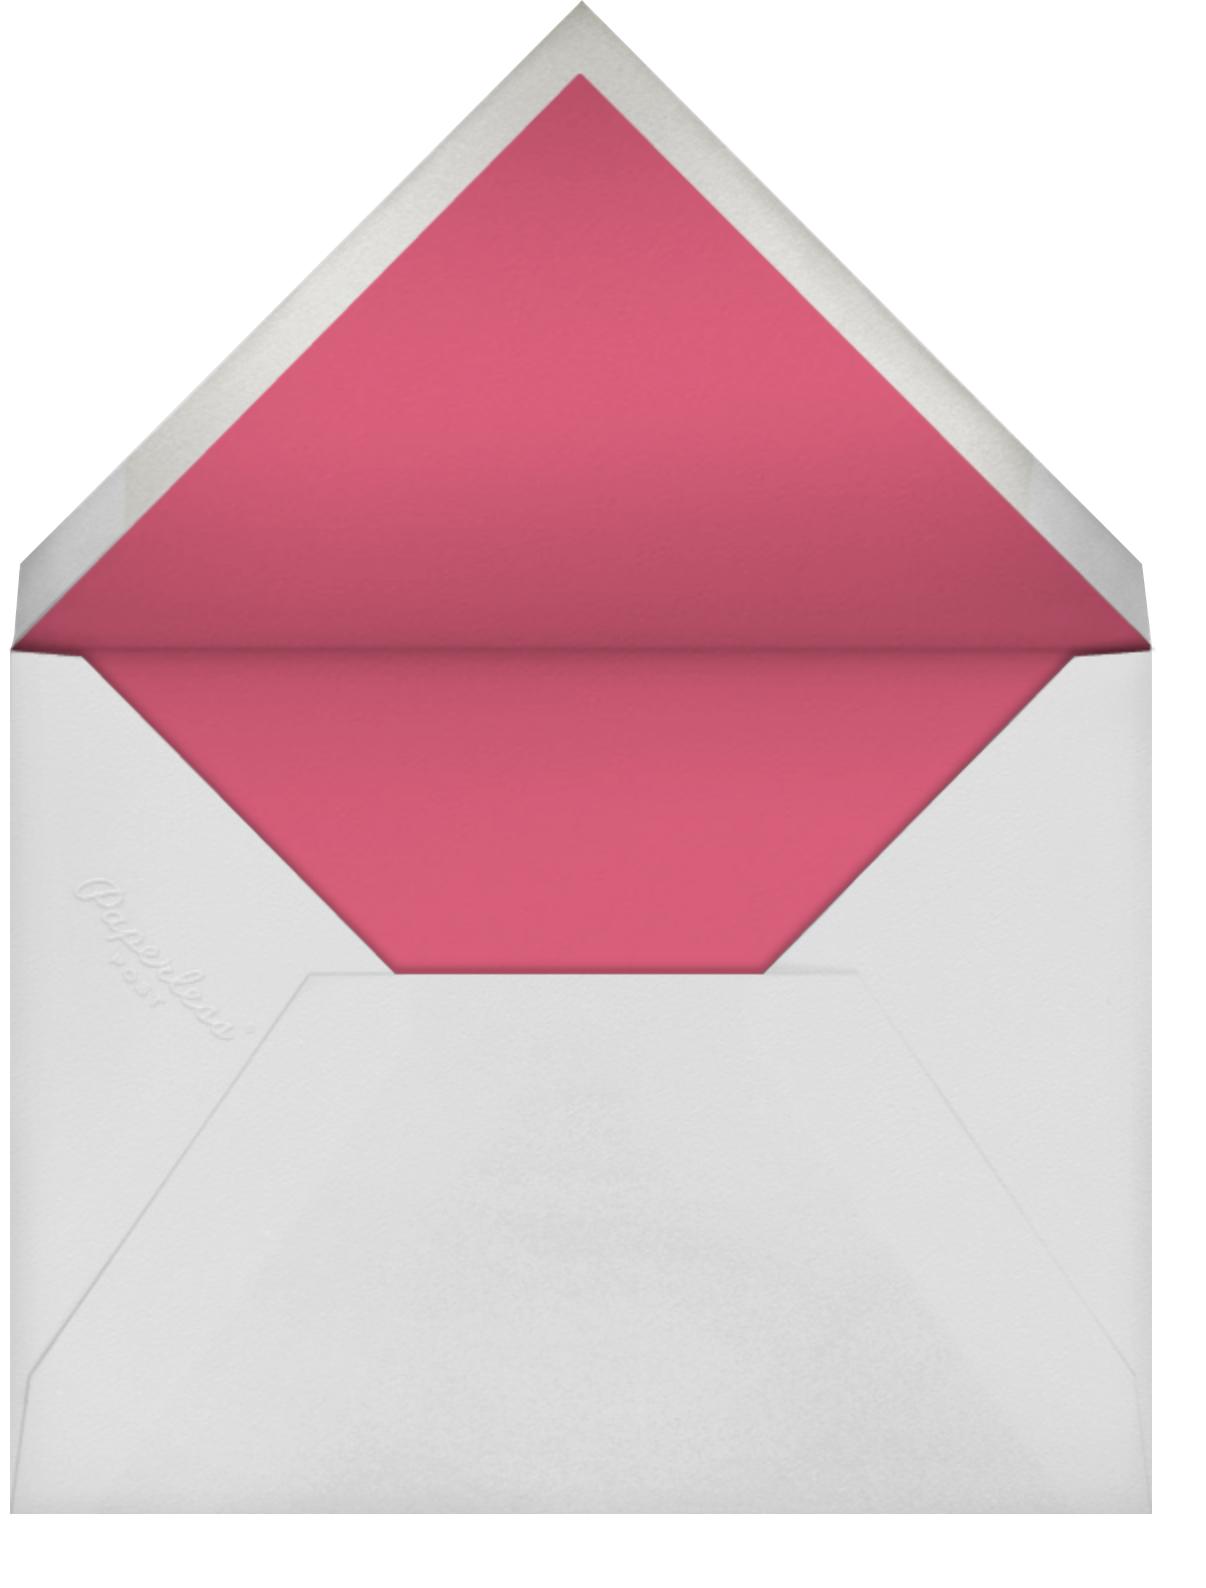 Square Frame - Horizontal (Red) - Paperless Post - Envelope